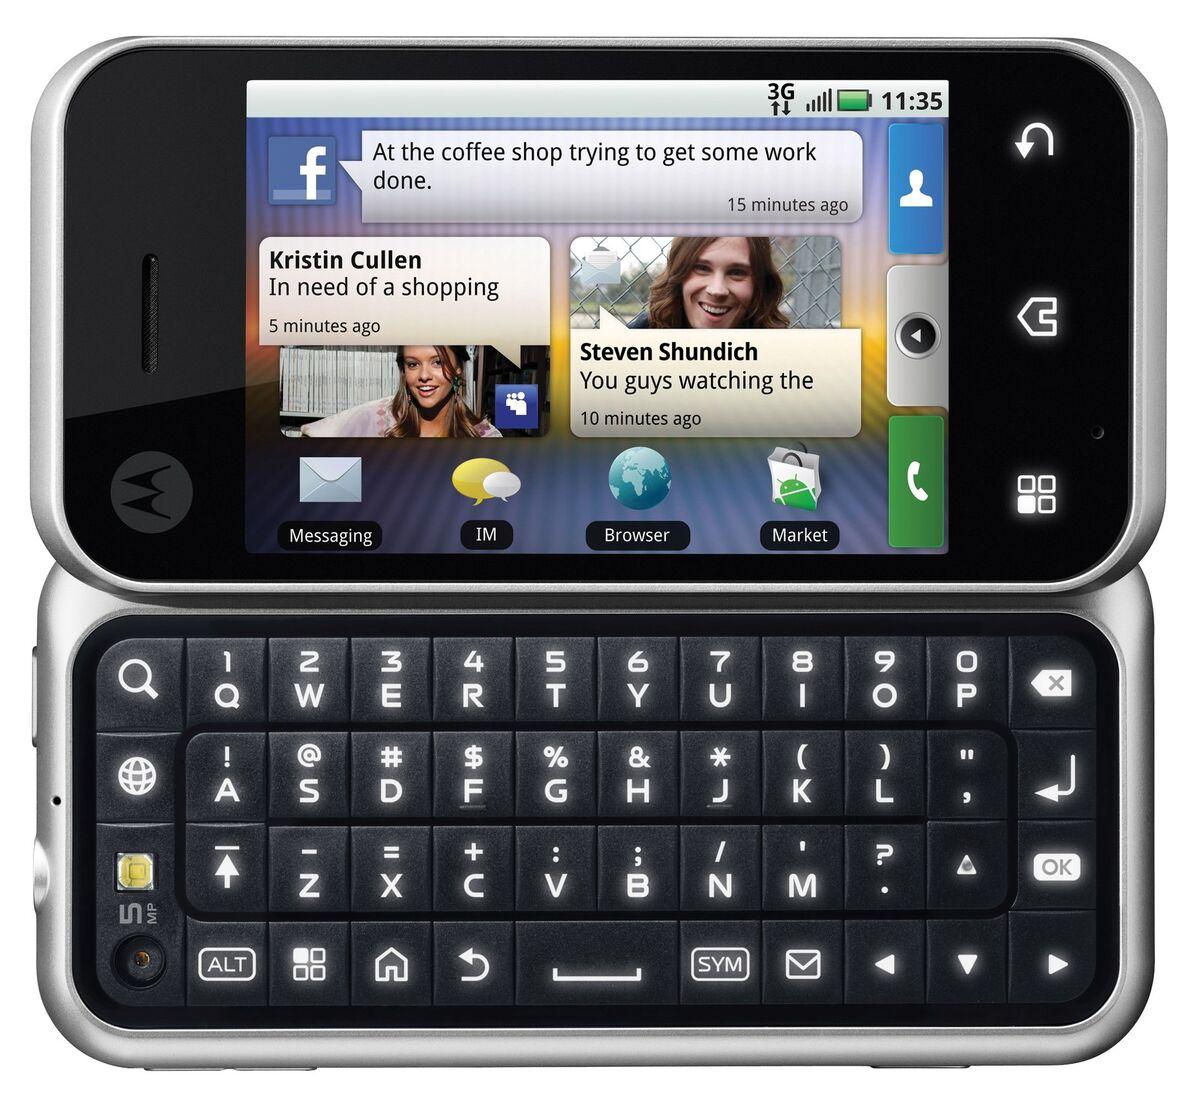 New Motorola Backflip MB300 Unlocked GSM Phone 3G Android OS 5MP Camera Motoblur